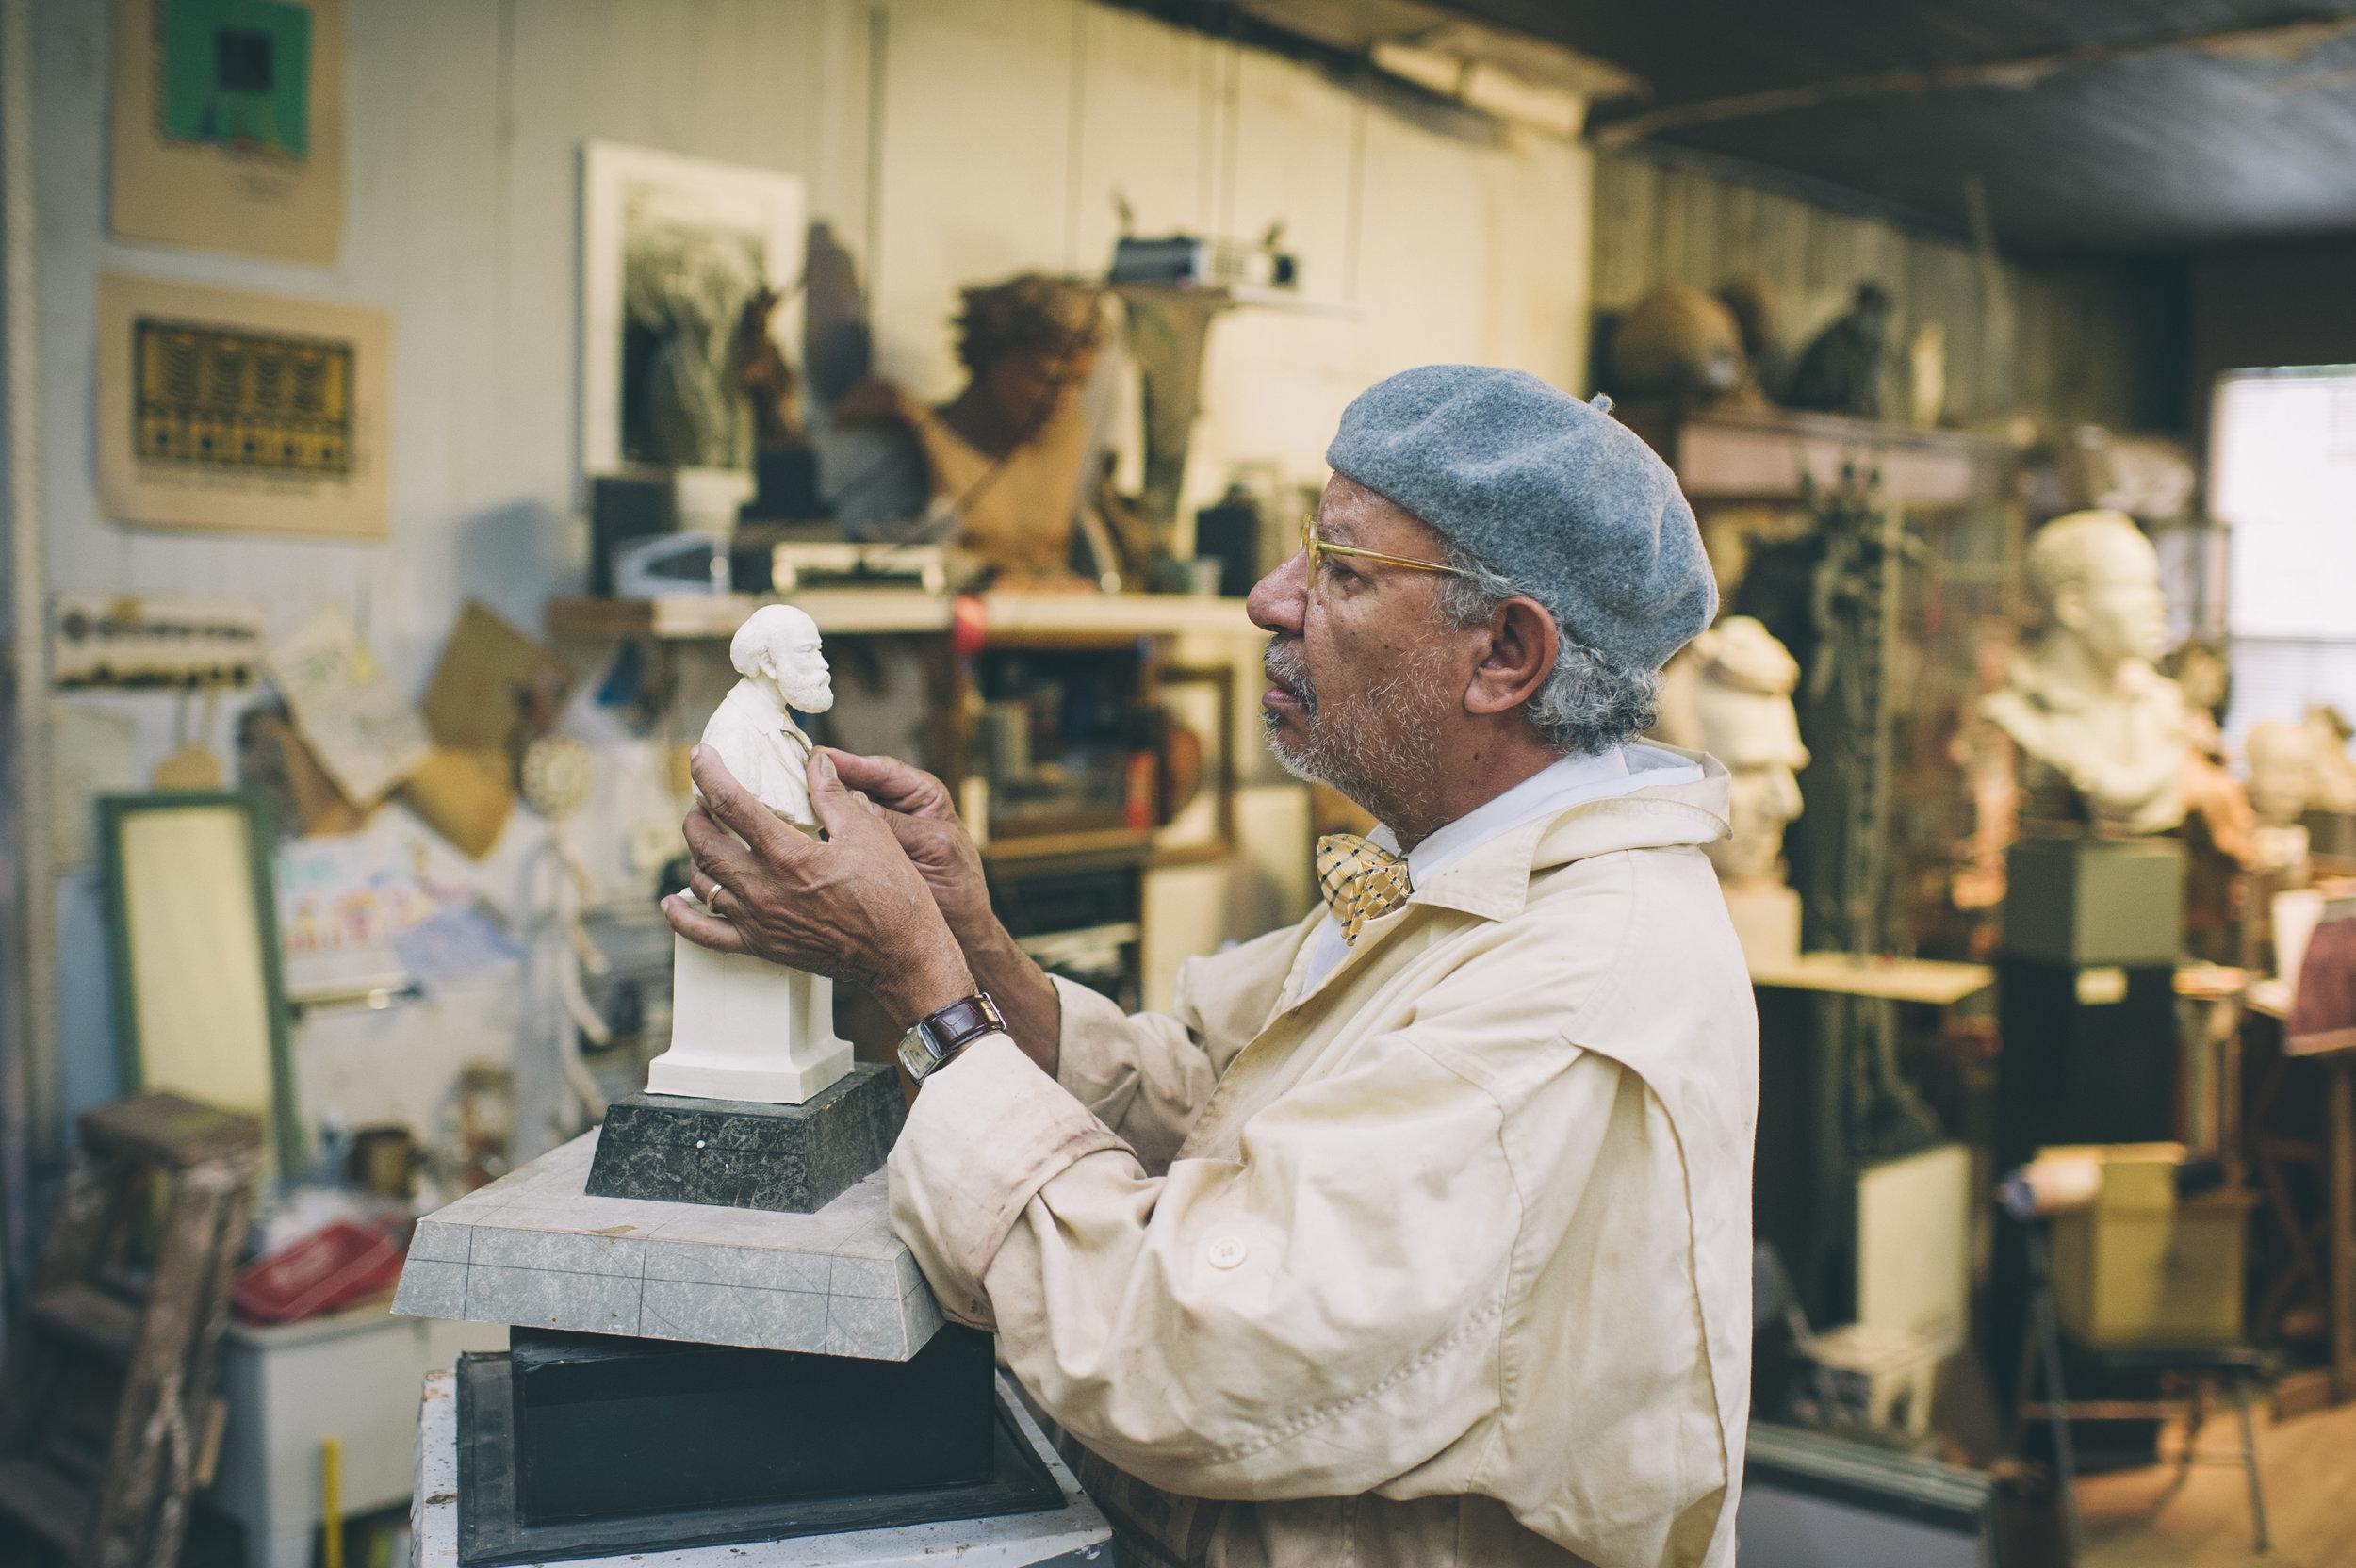 Ed Hamilton at work in his studio. Photo by Sarah Katherine Davis/courtesy of LVA.